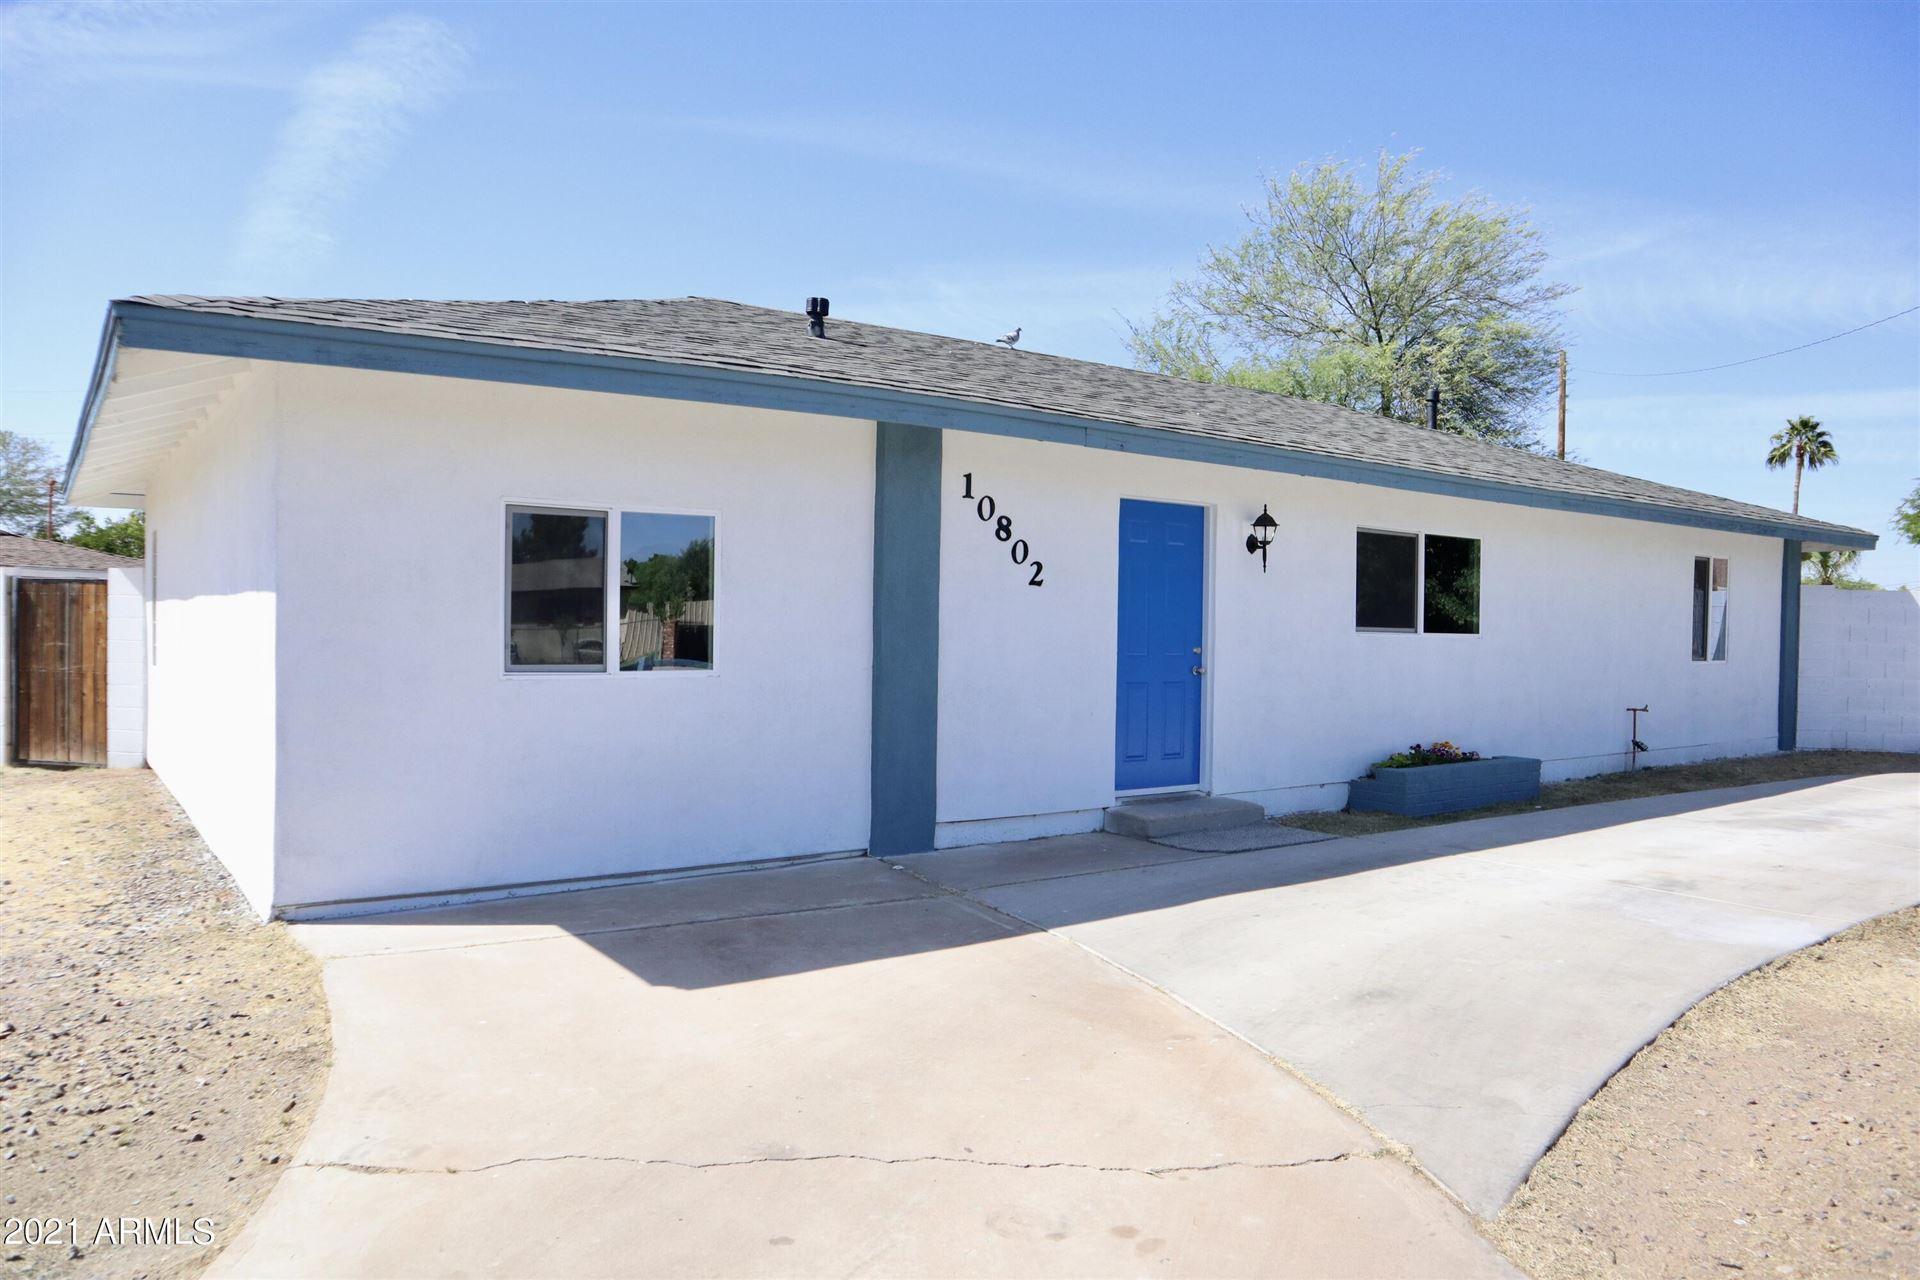 Photo of 10802 W 3RD Street, Avondale, AZ 85323 (MLS # 6232452)